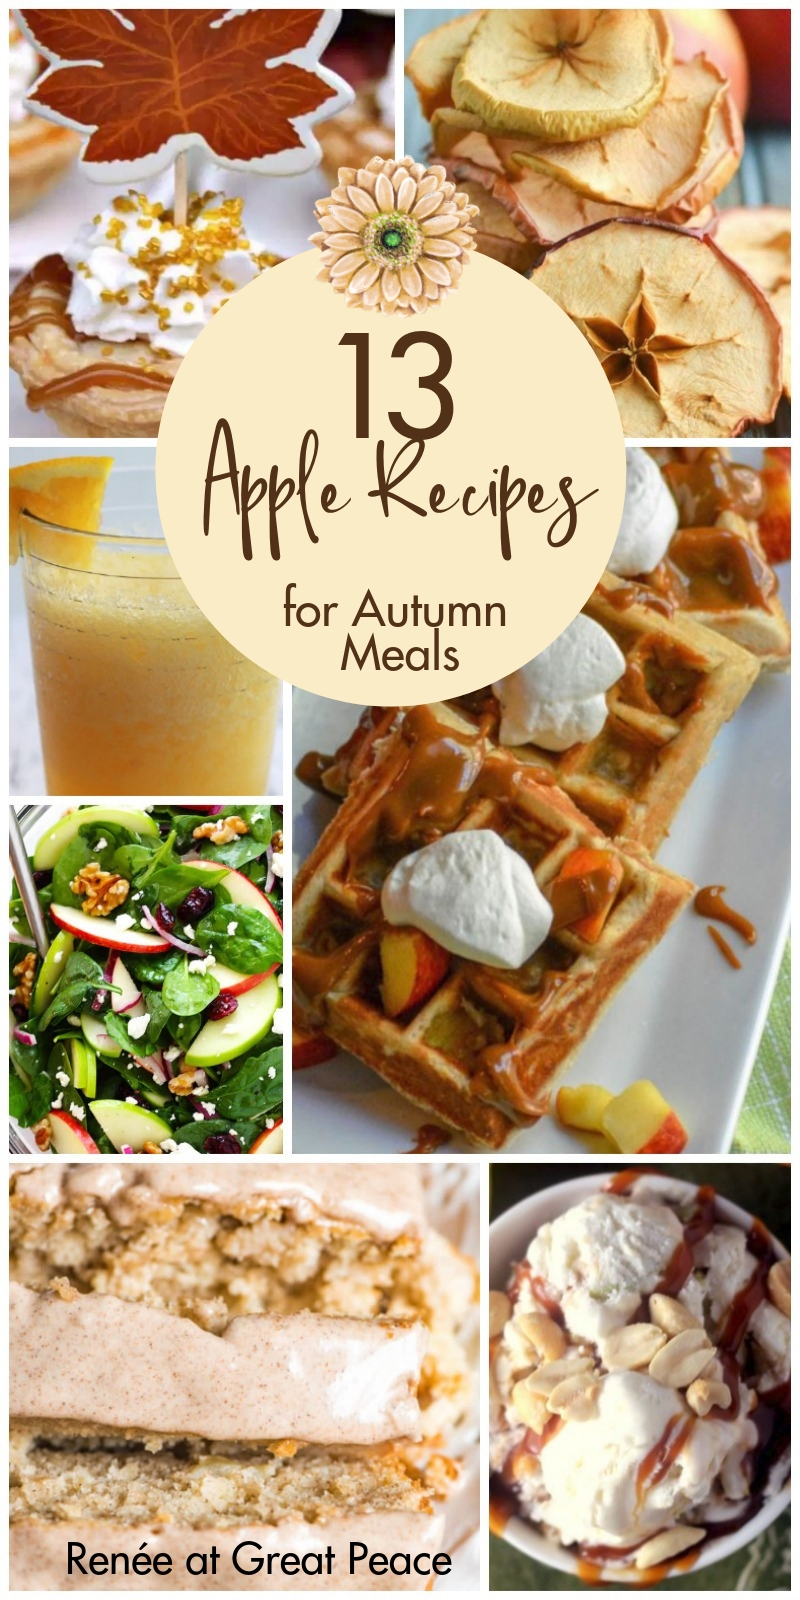 13 Apple Recipes for Autumn Meals | Renée at Great Peace #mealplanning #autumn #fallrecipes